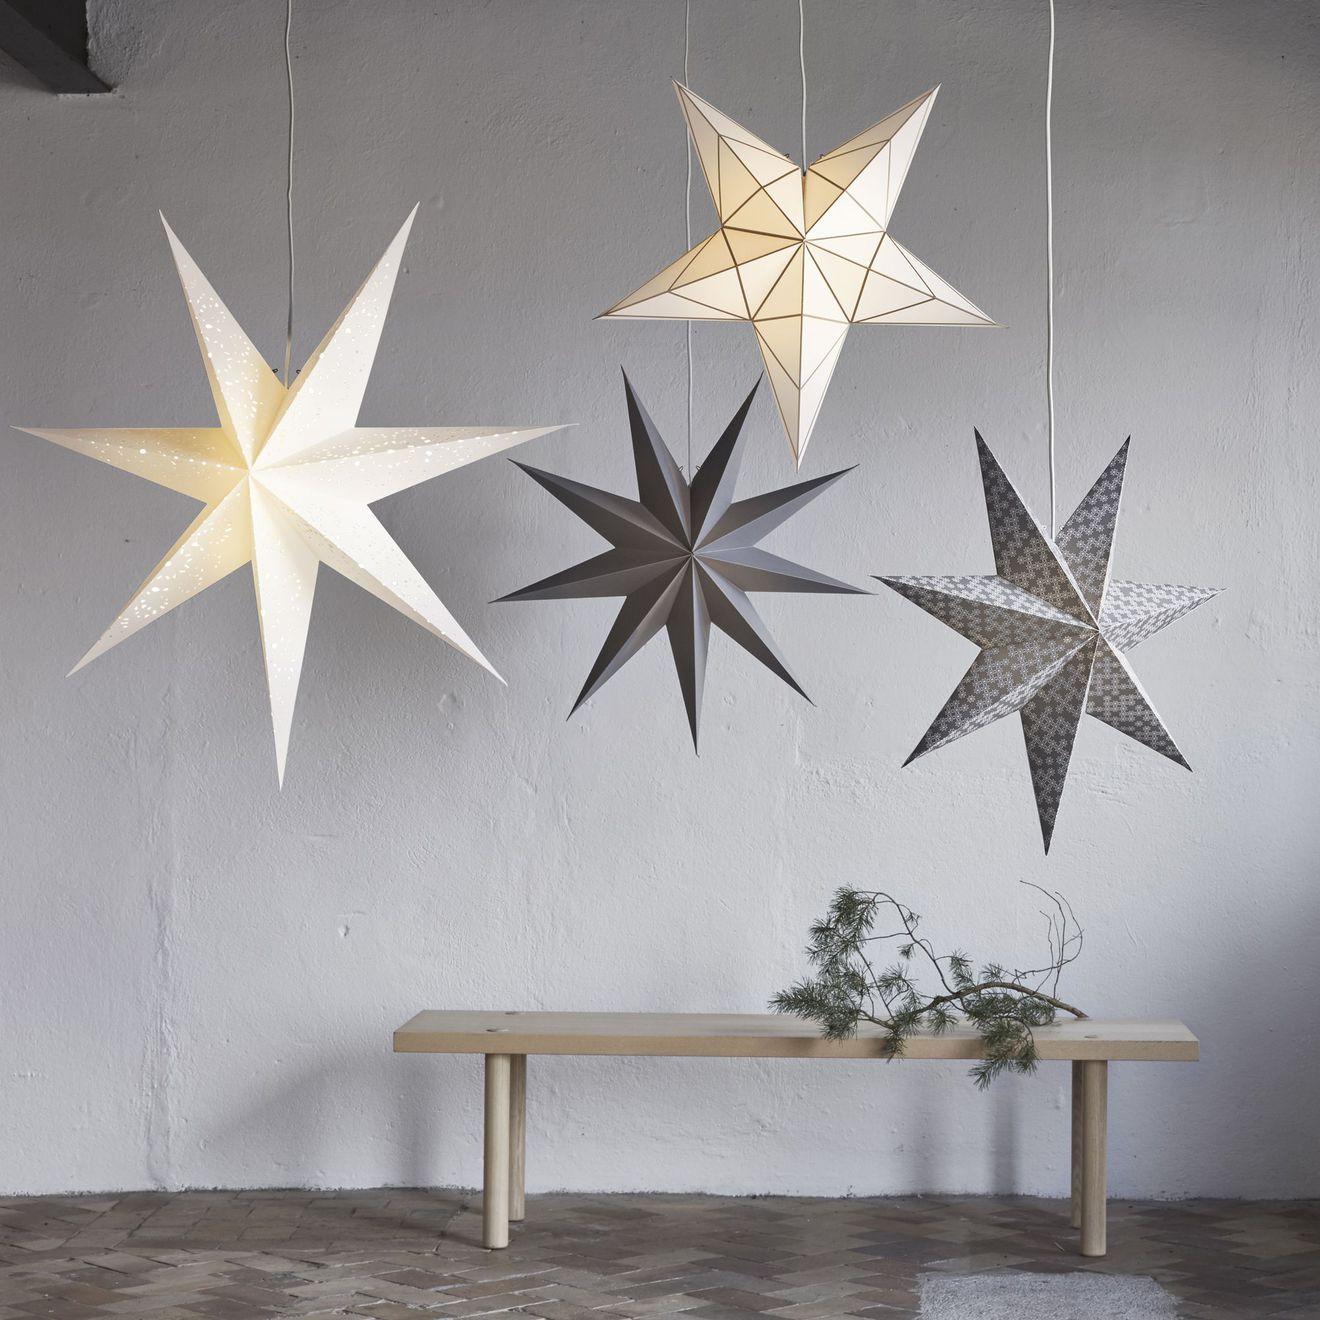 ikea noel 2017 holidaze pinterest noel noel 2017 and deco noel. Black Bedroom Furniture Sets. Home Design Ideas